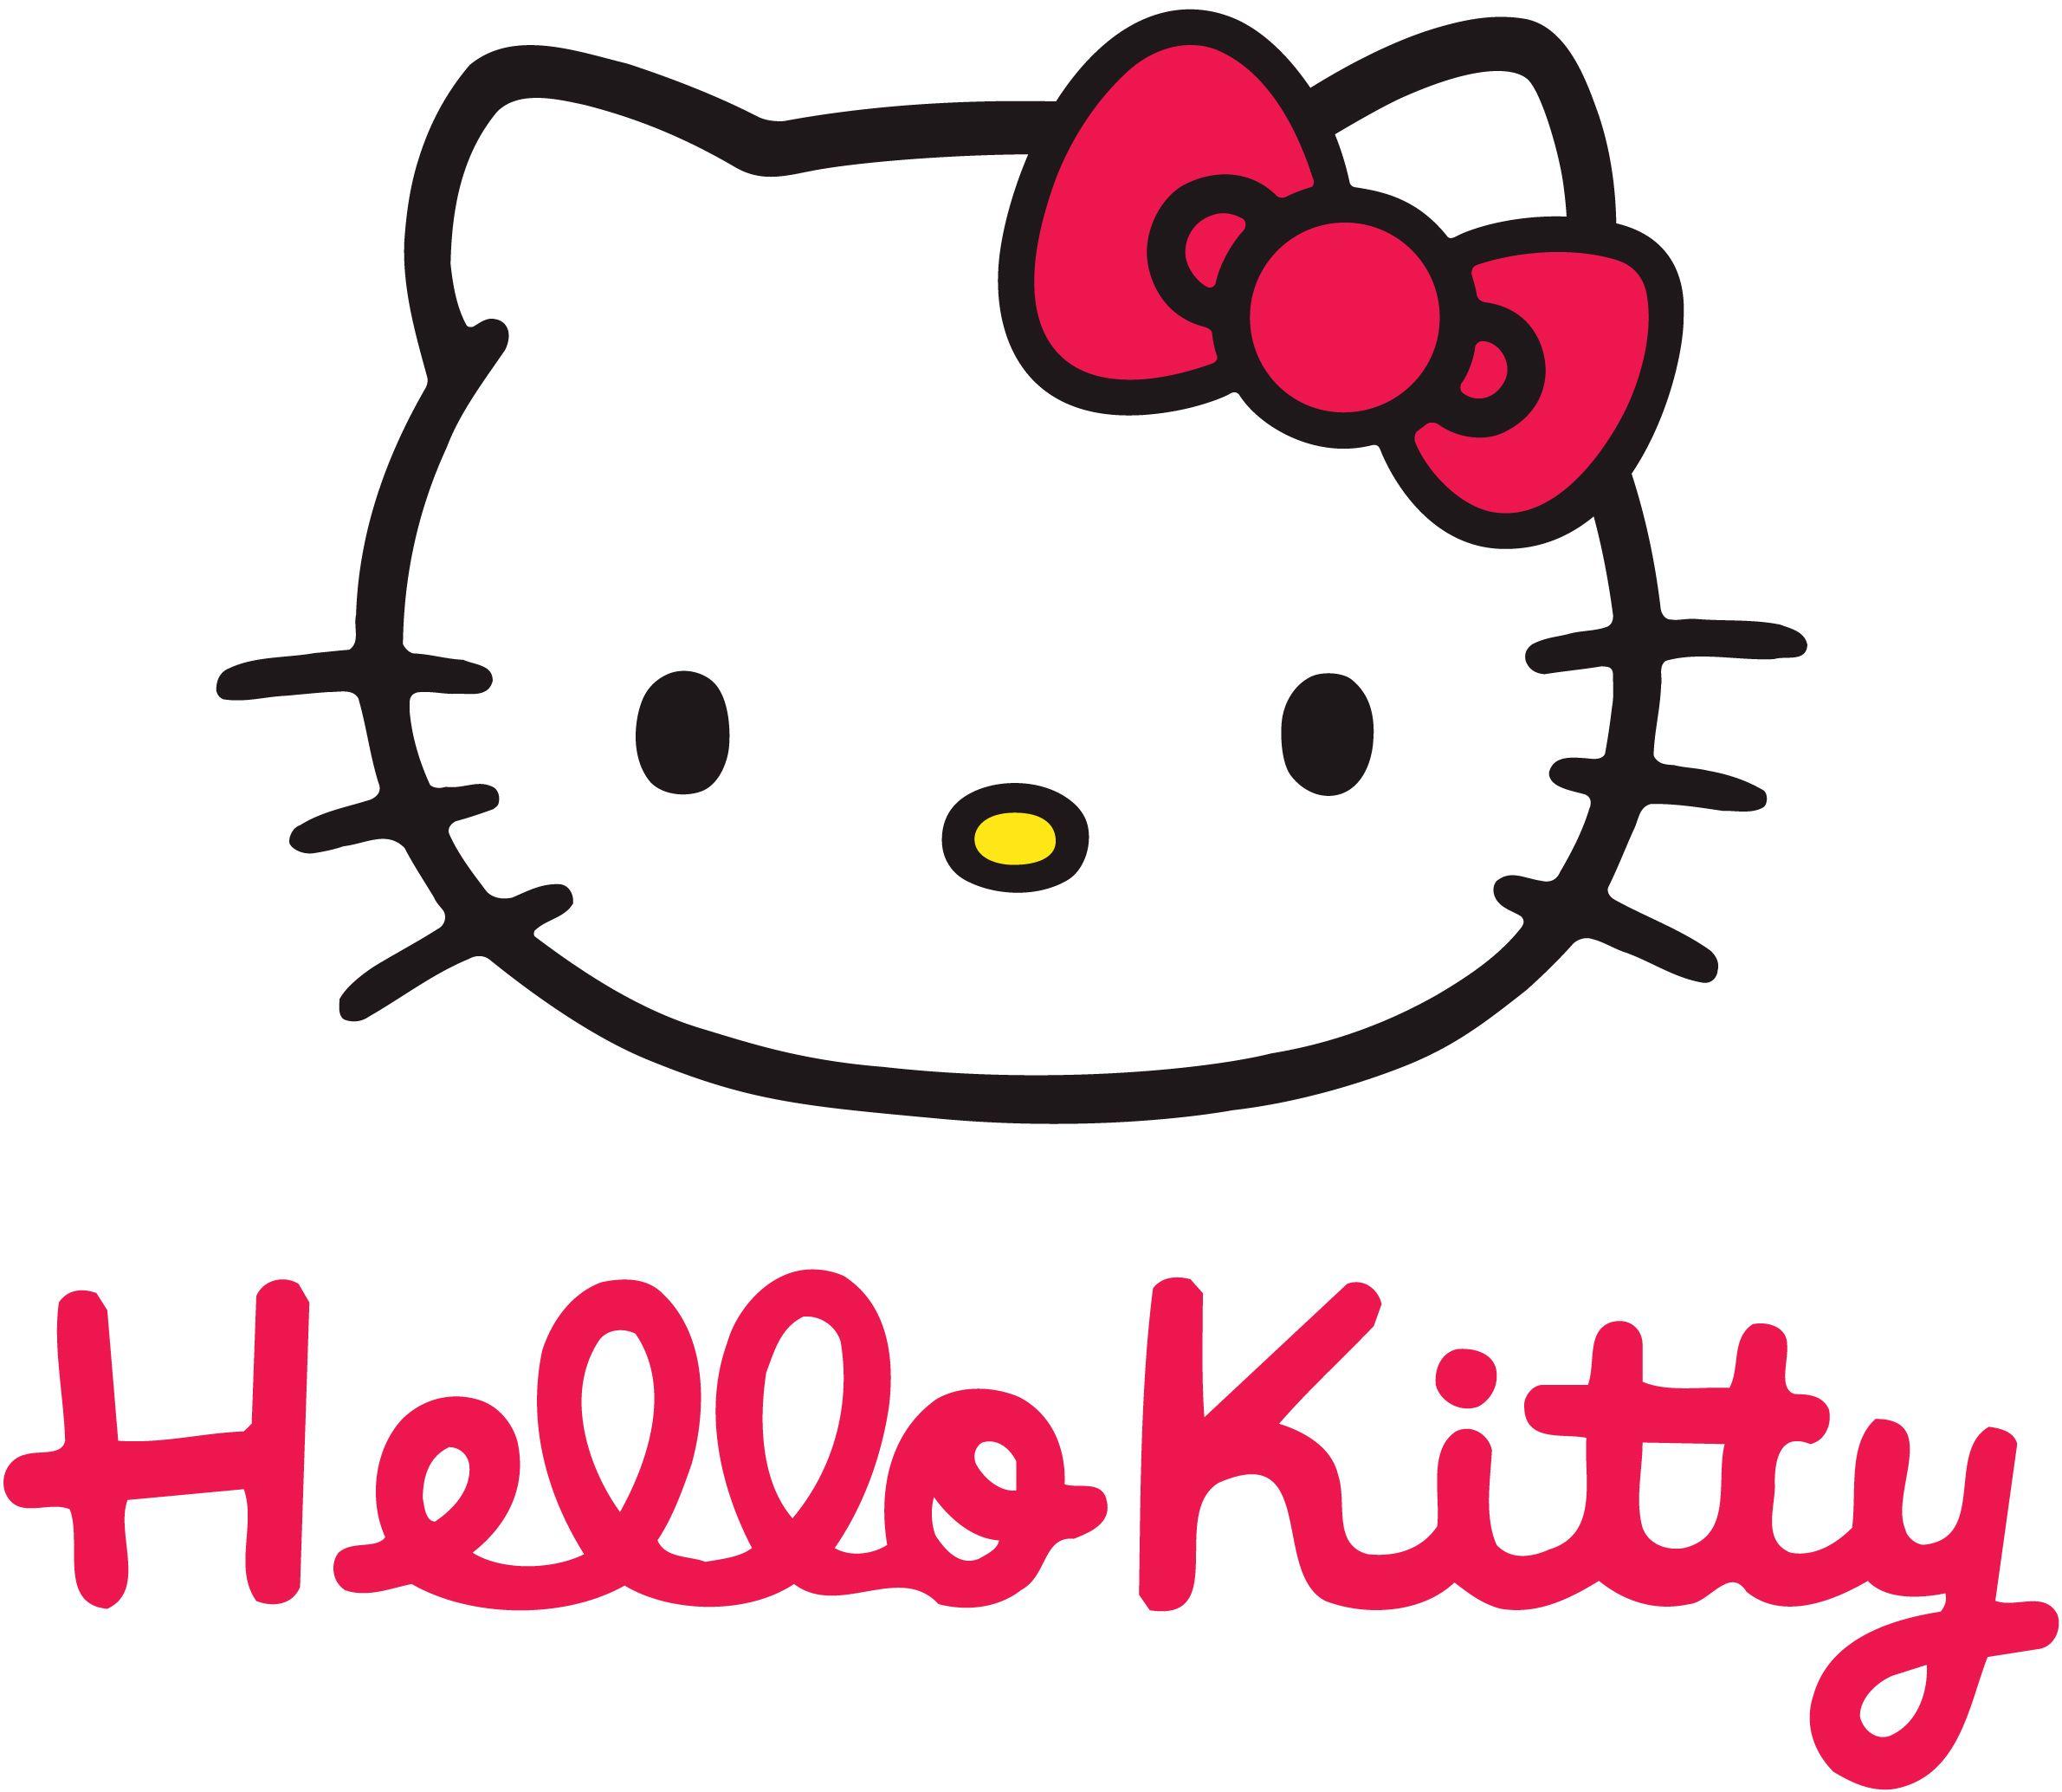 Znalezione obrazy dla zapytania hello kitty logo